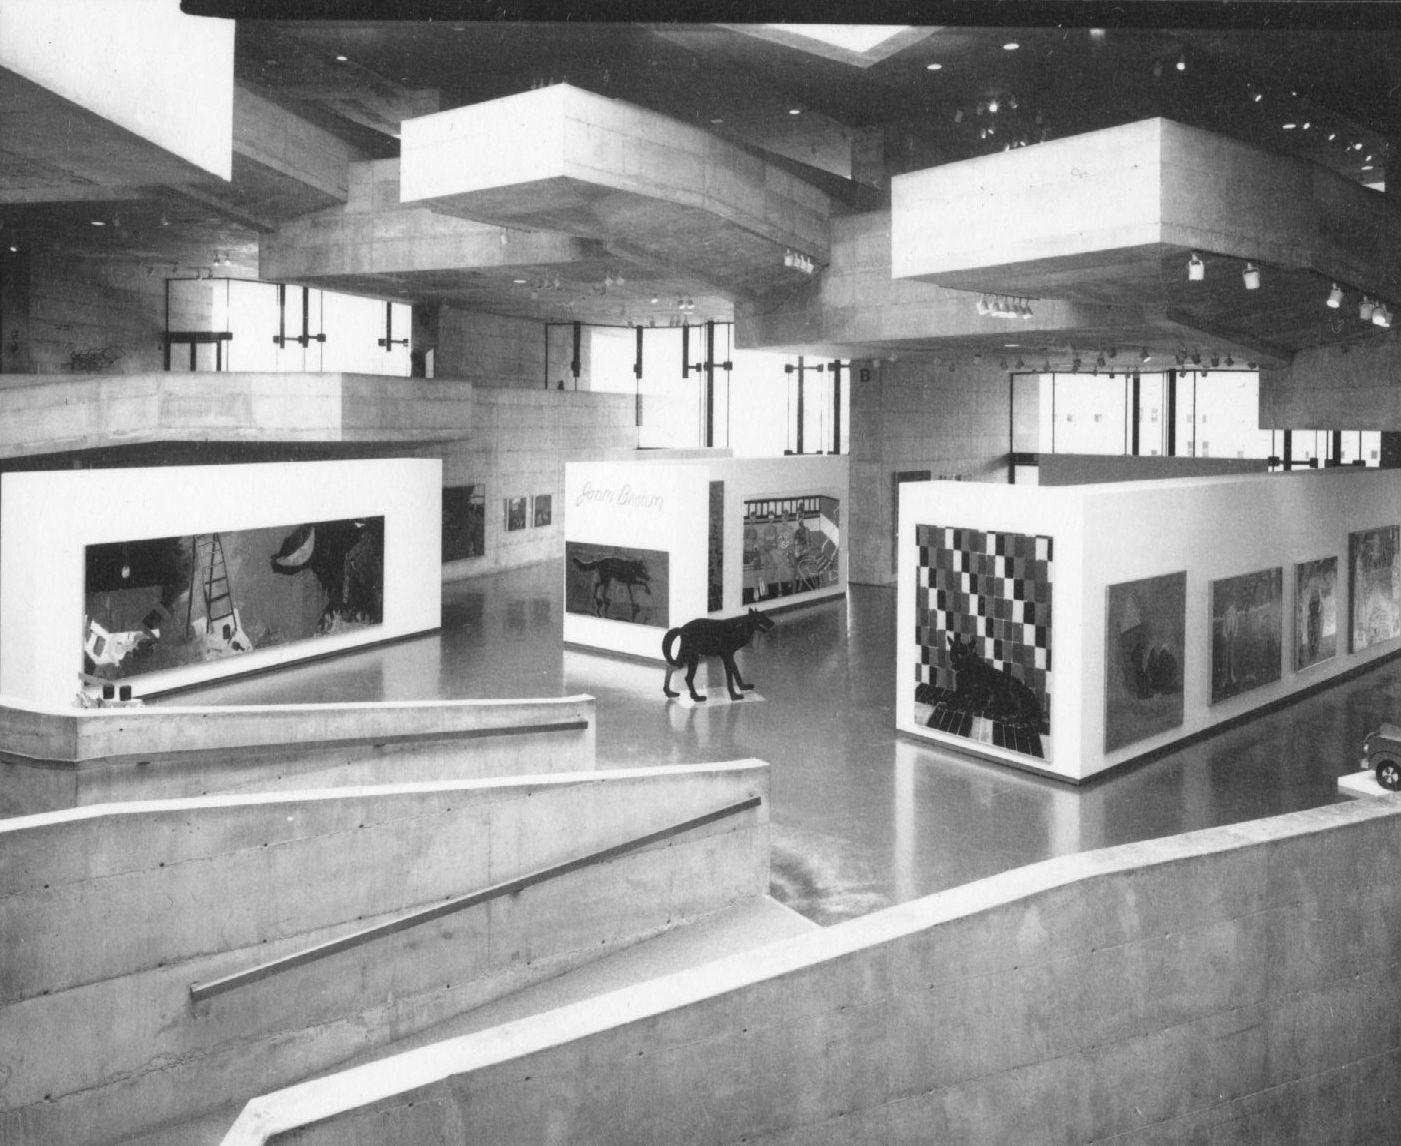 University Art Museum, University of California, Berkeley, Joan Brown, 1974 2.jpg